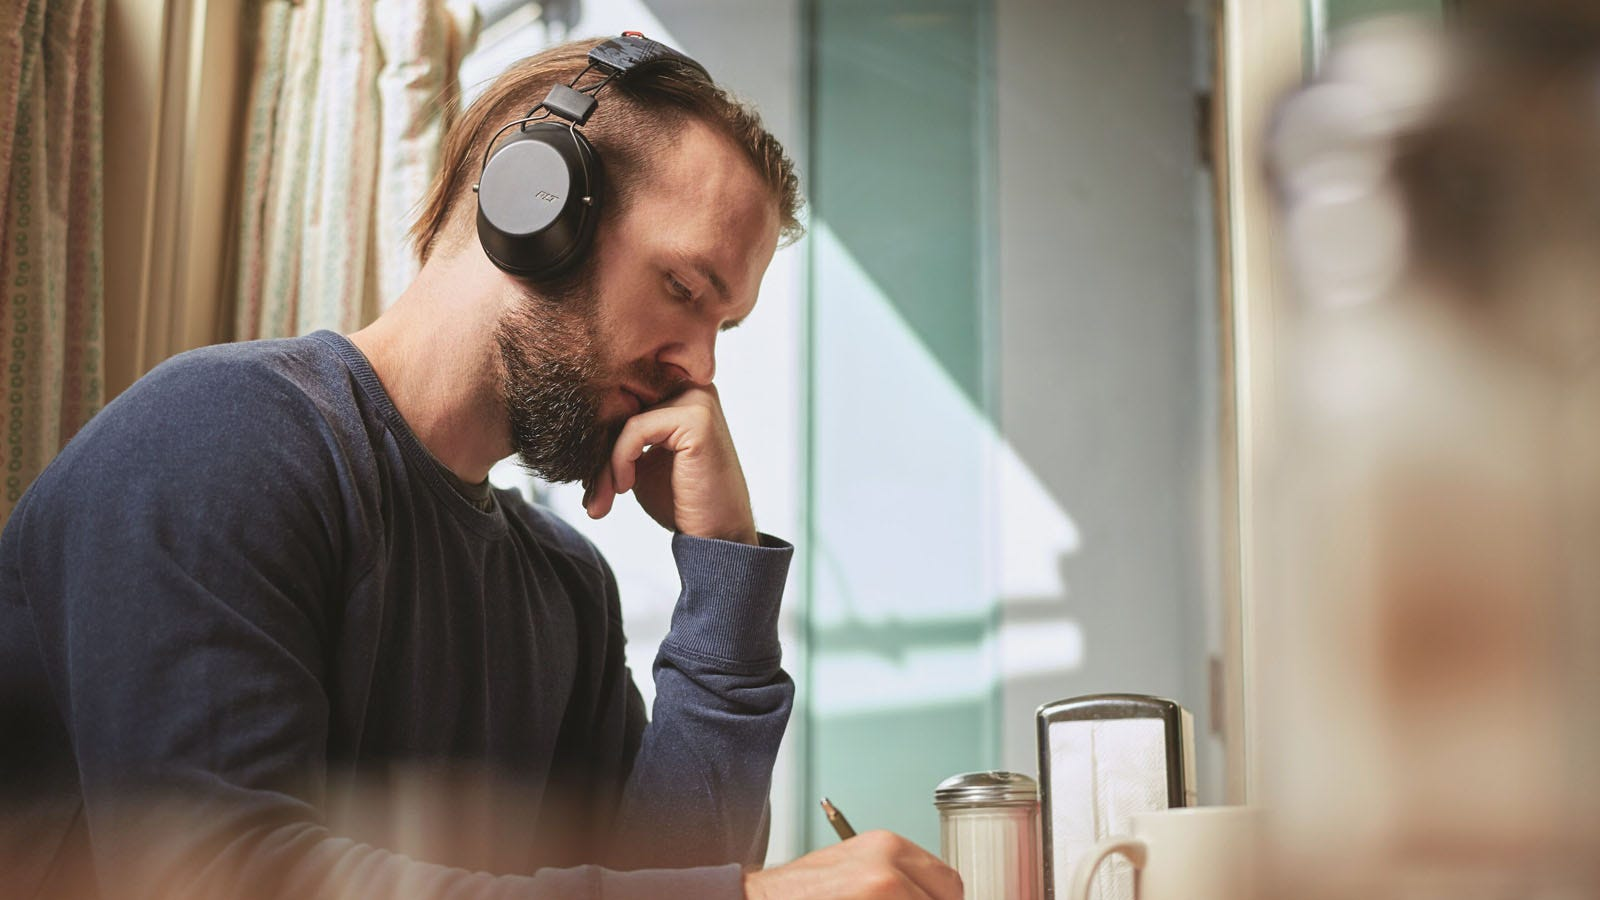 Image of a man wearing headphones